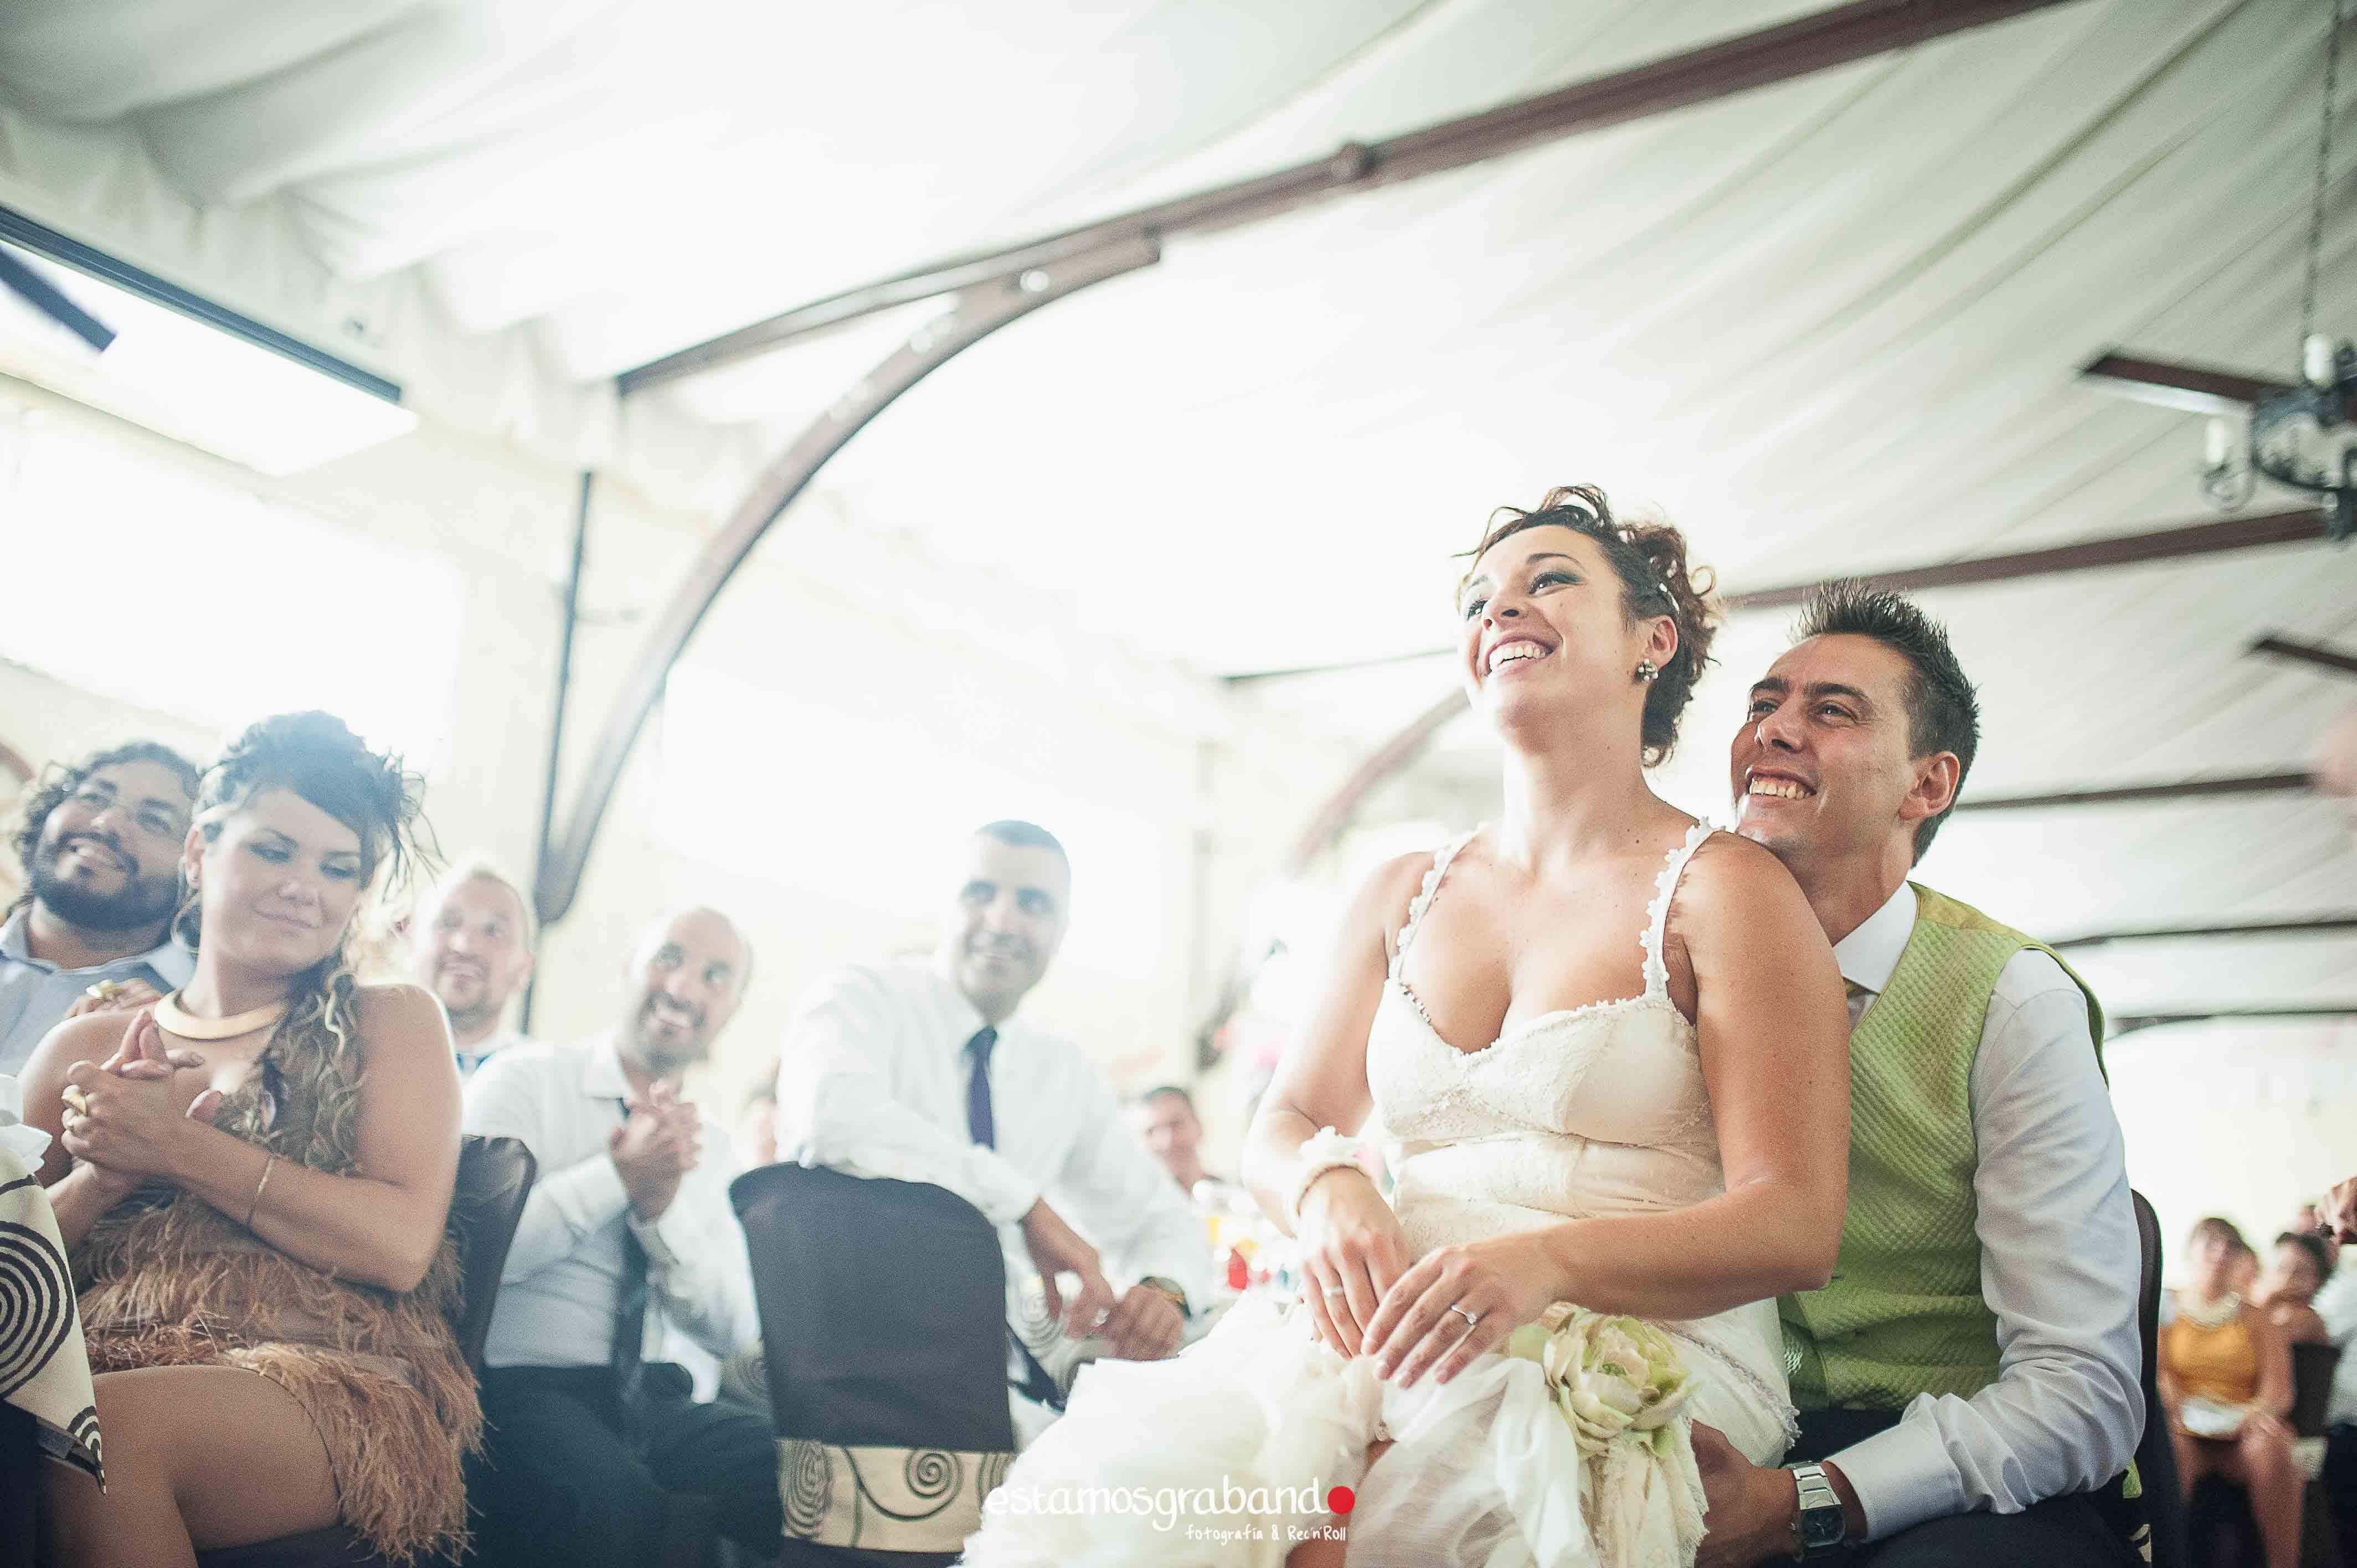 pili-y-jose_fotograficc81a-cadiz-80 Pili & Jose - video boda cadiz